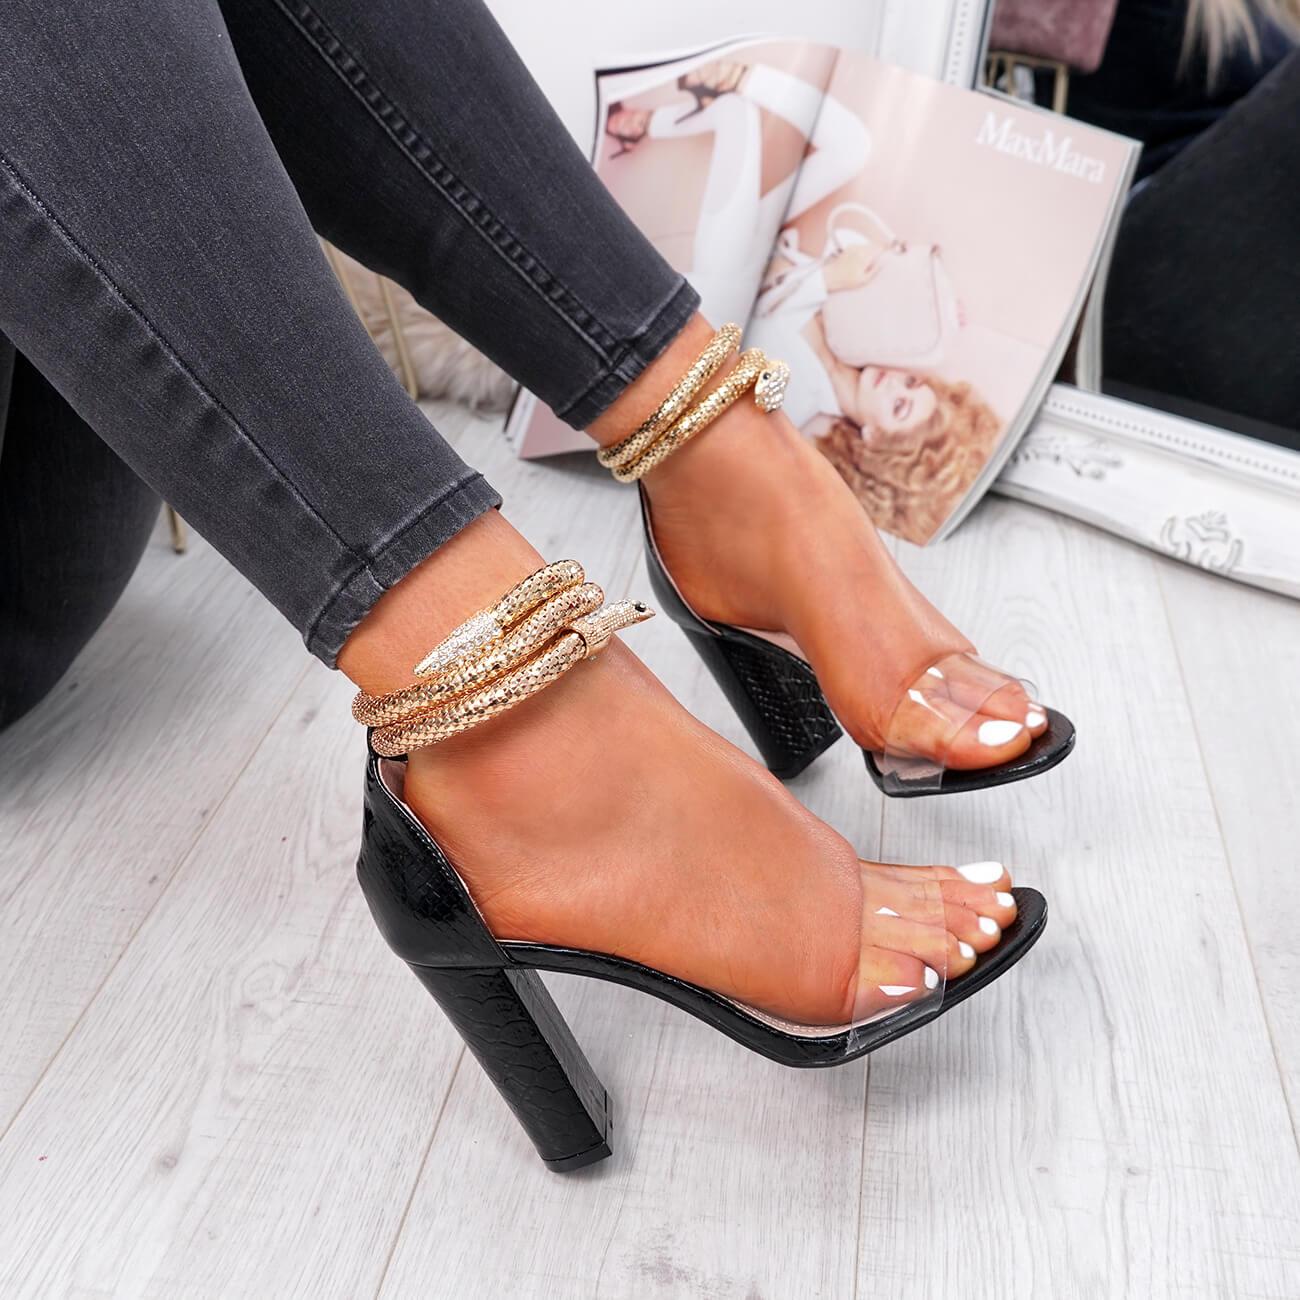 New Women Summer Party Casual Shiny Peep Toe Block Heel Sandal UK Sizes 3-8